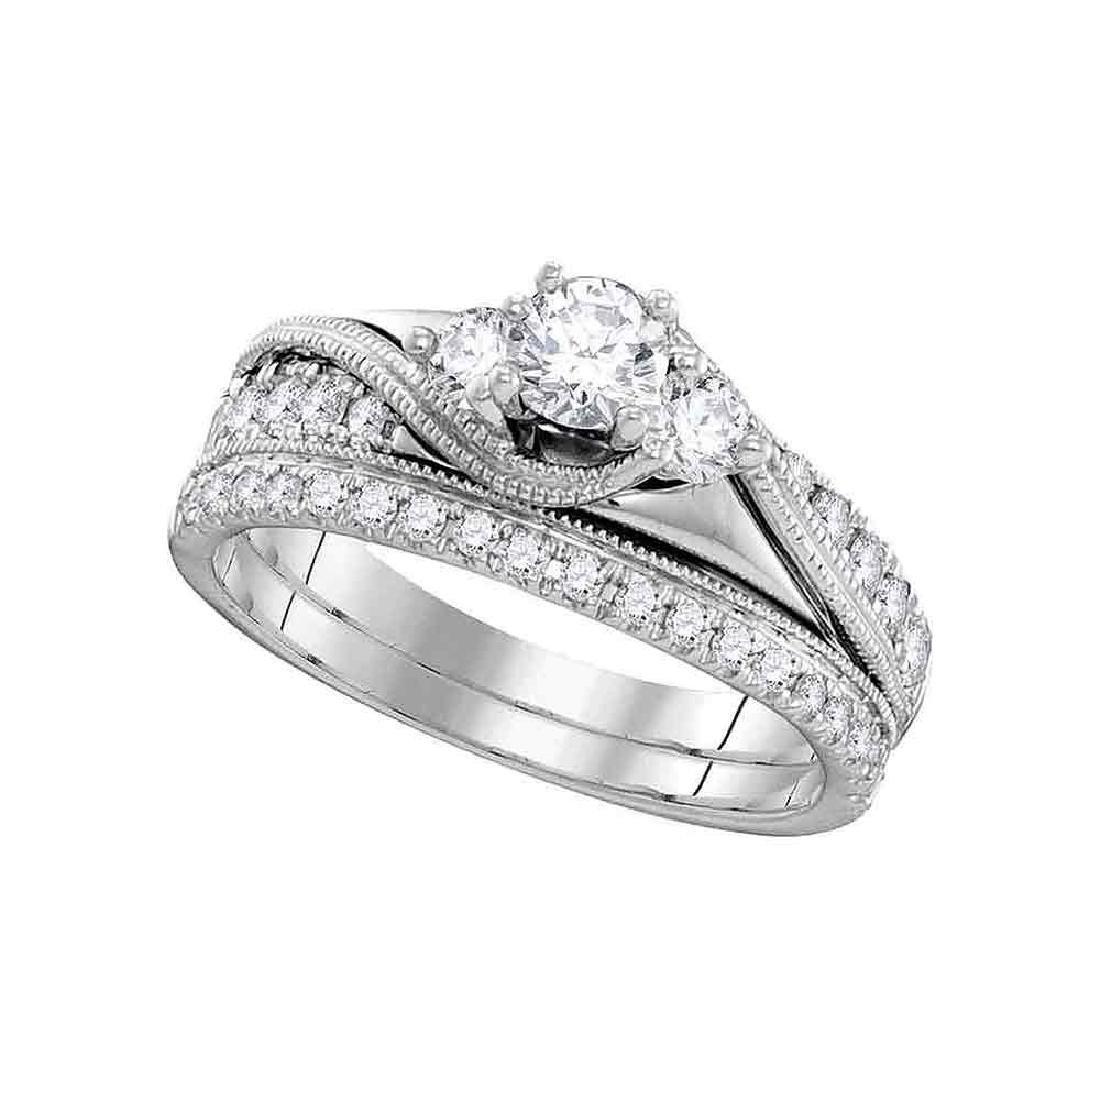 14k White Gold 3-Stone Diamond Bridal Wedding Engagemen